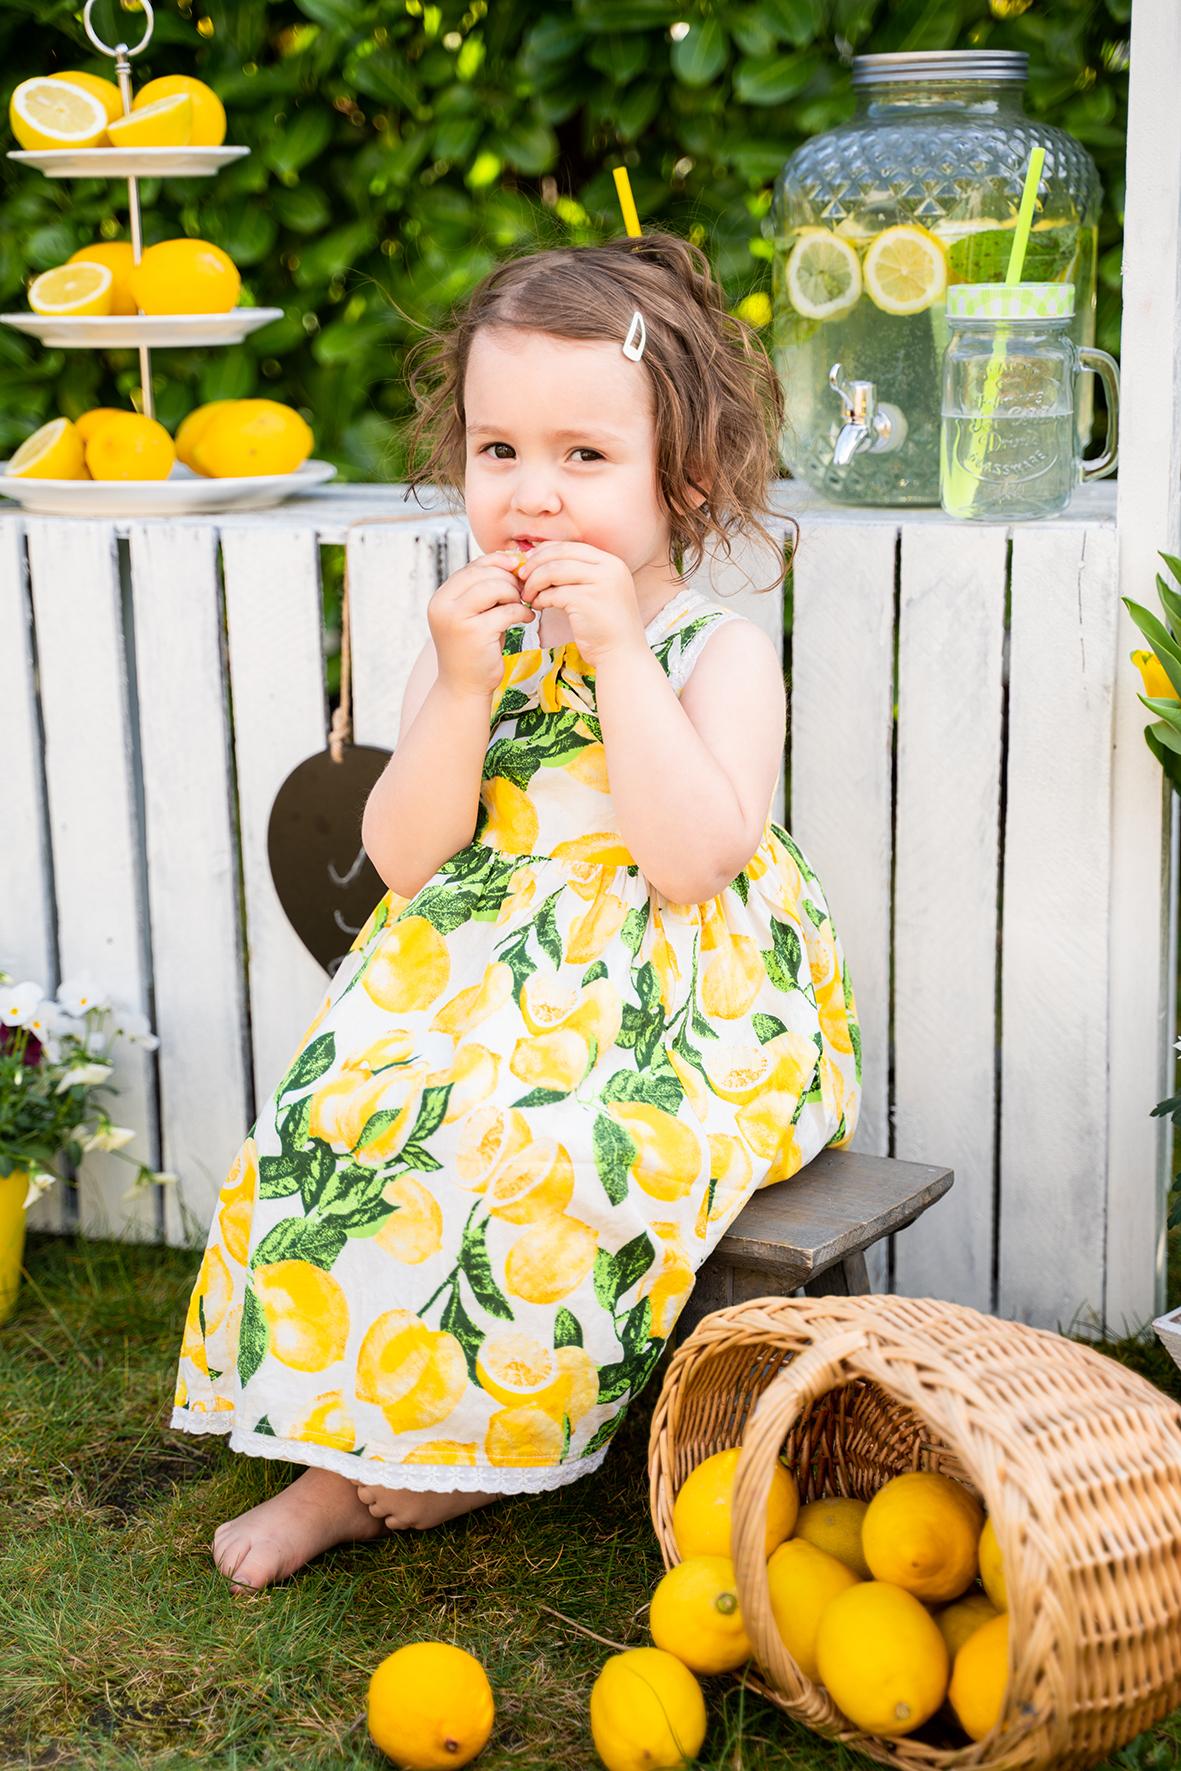 Gartenshooting in Lilienthal Corona Fotoshooting mit dir Limonadenstand Fotoaktion Bremen